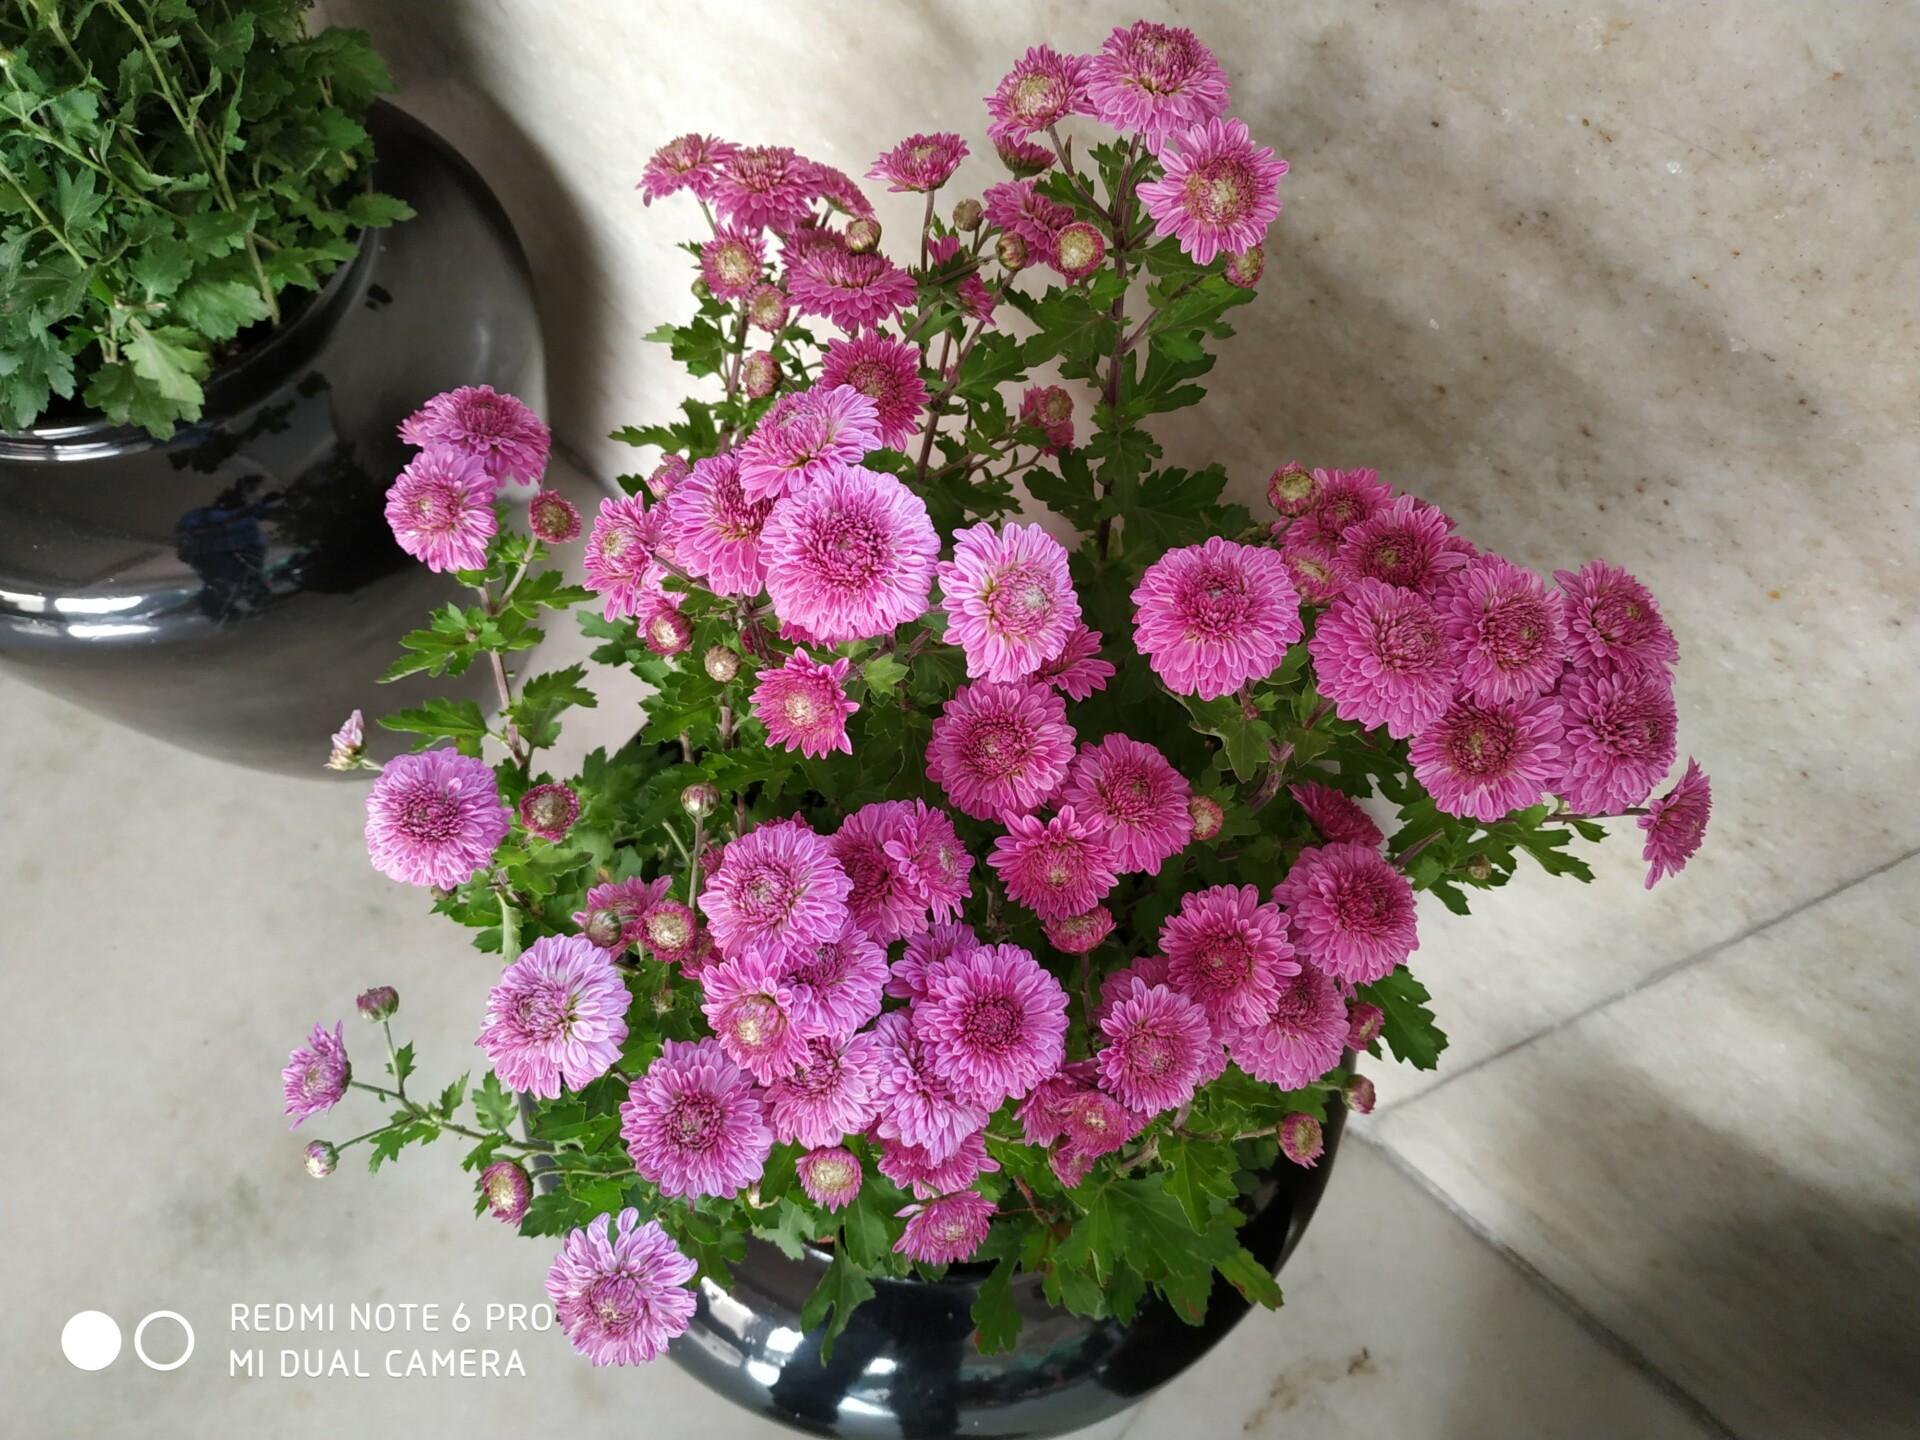 Redmi Note 6 Pro flowers sample shot